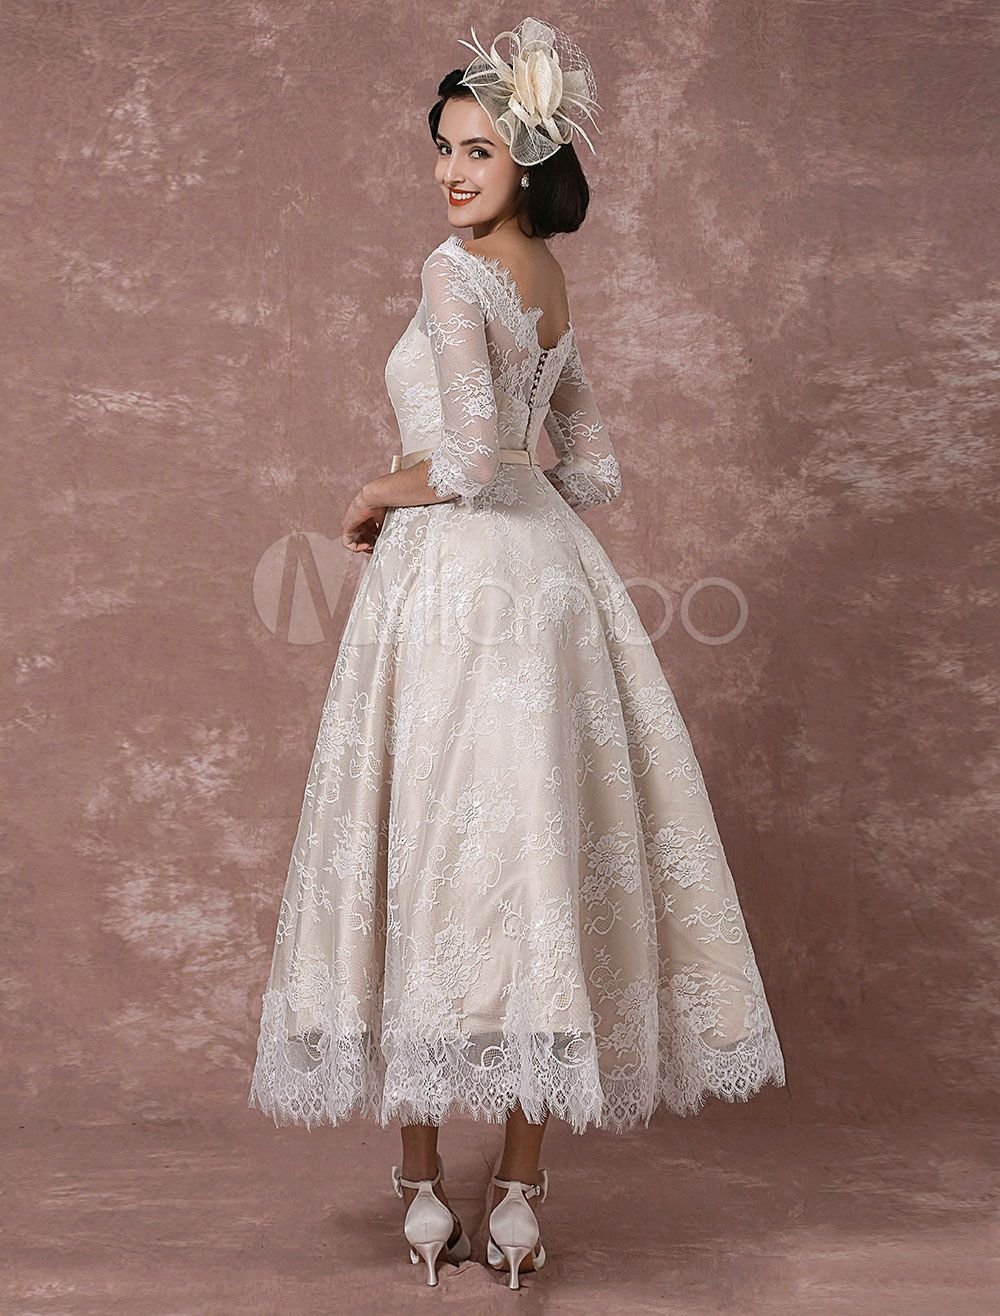 Lace Wedding Dress Vintage Bateau Champagne Half Sleeves Bridal Gown ...